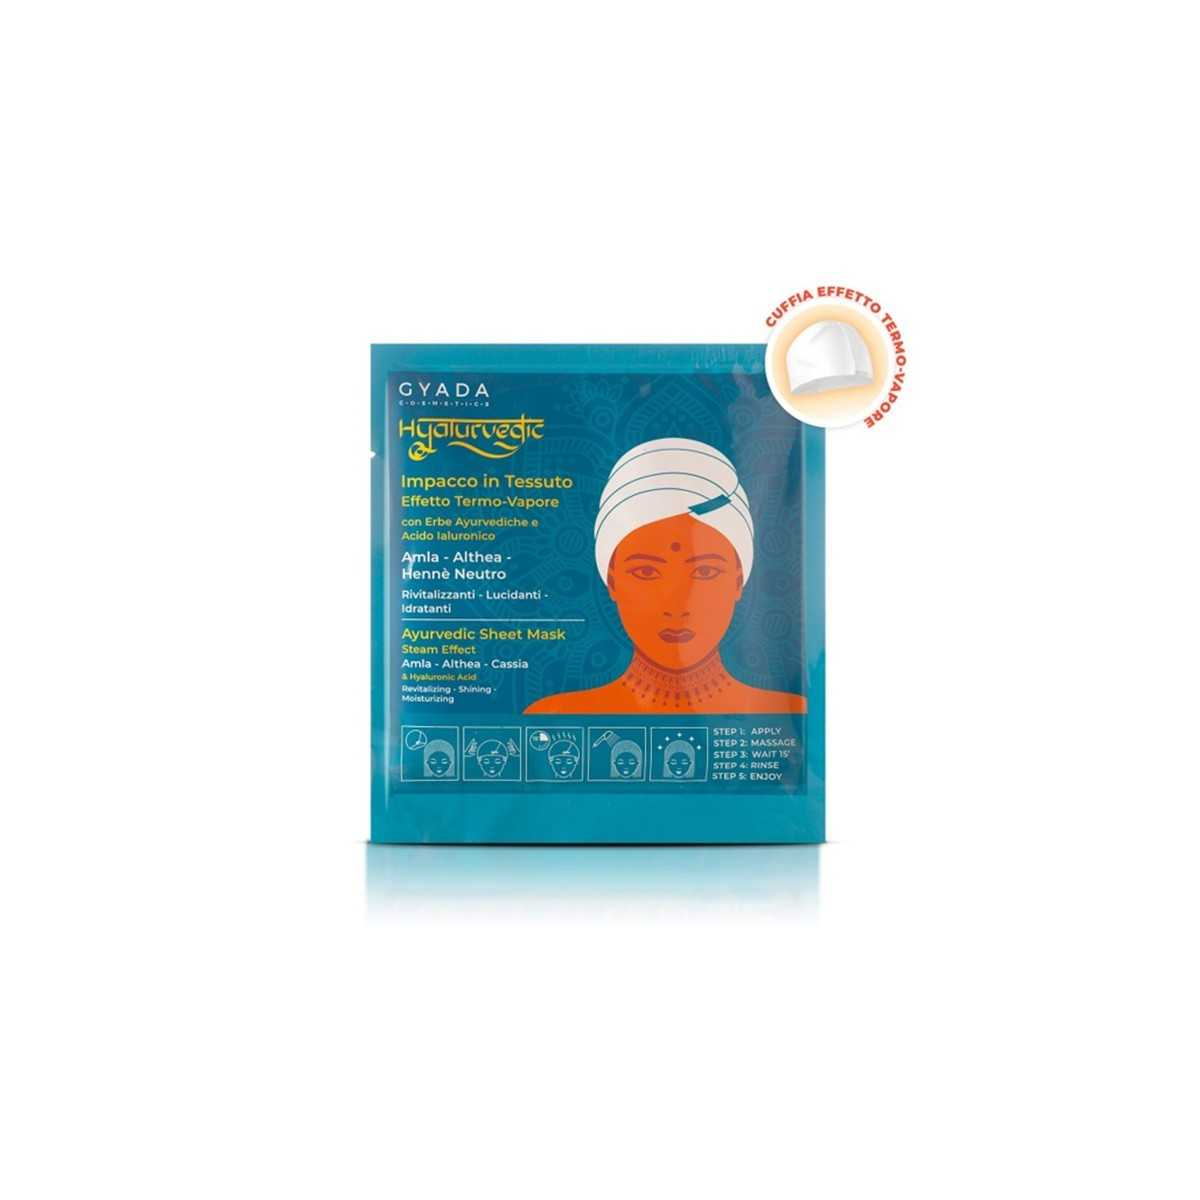 Hyalurvedic Revitalising Hair Sheet Mask